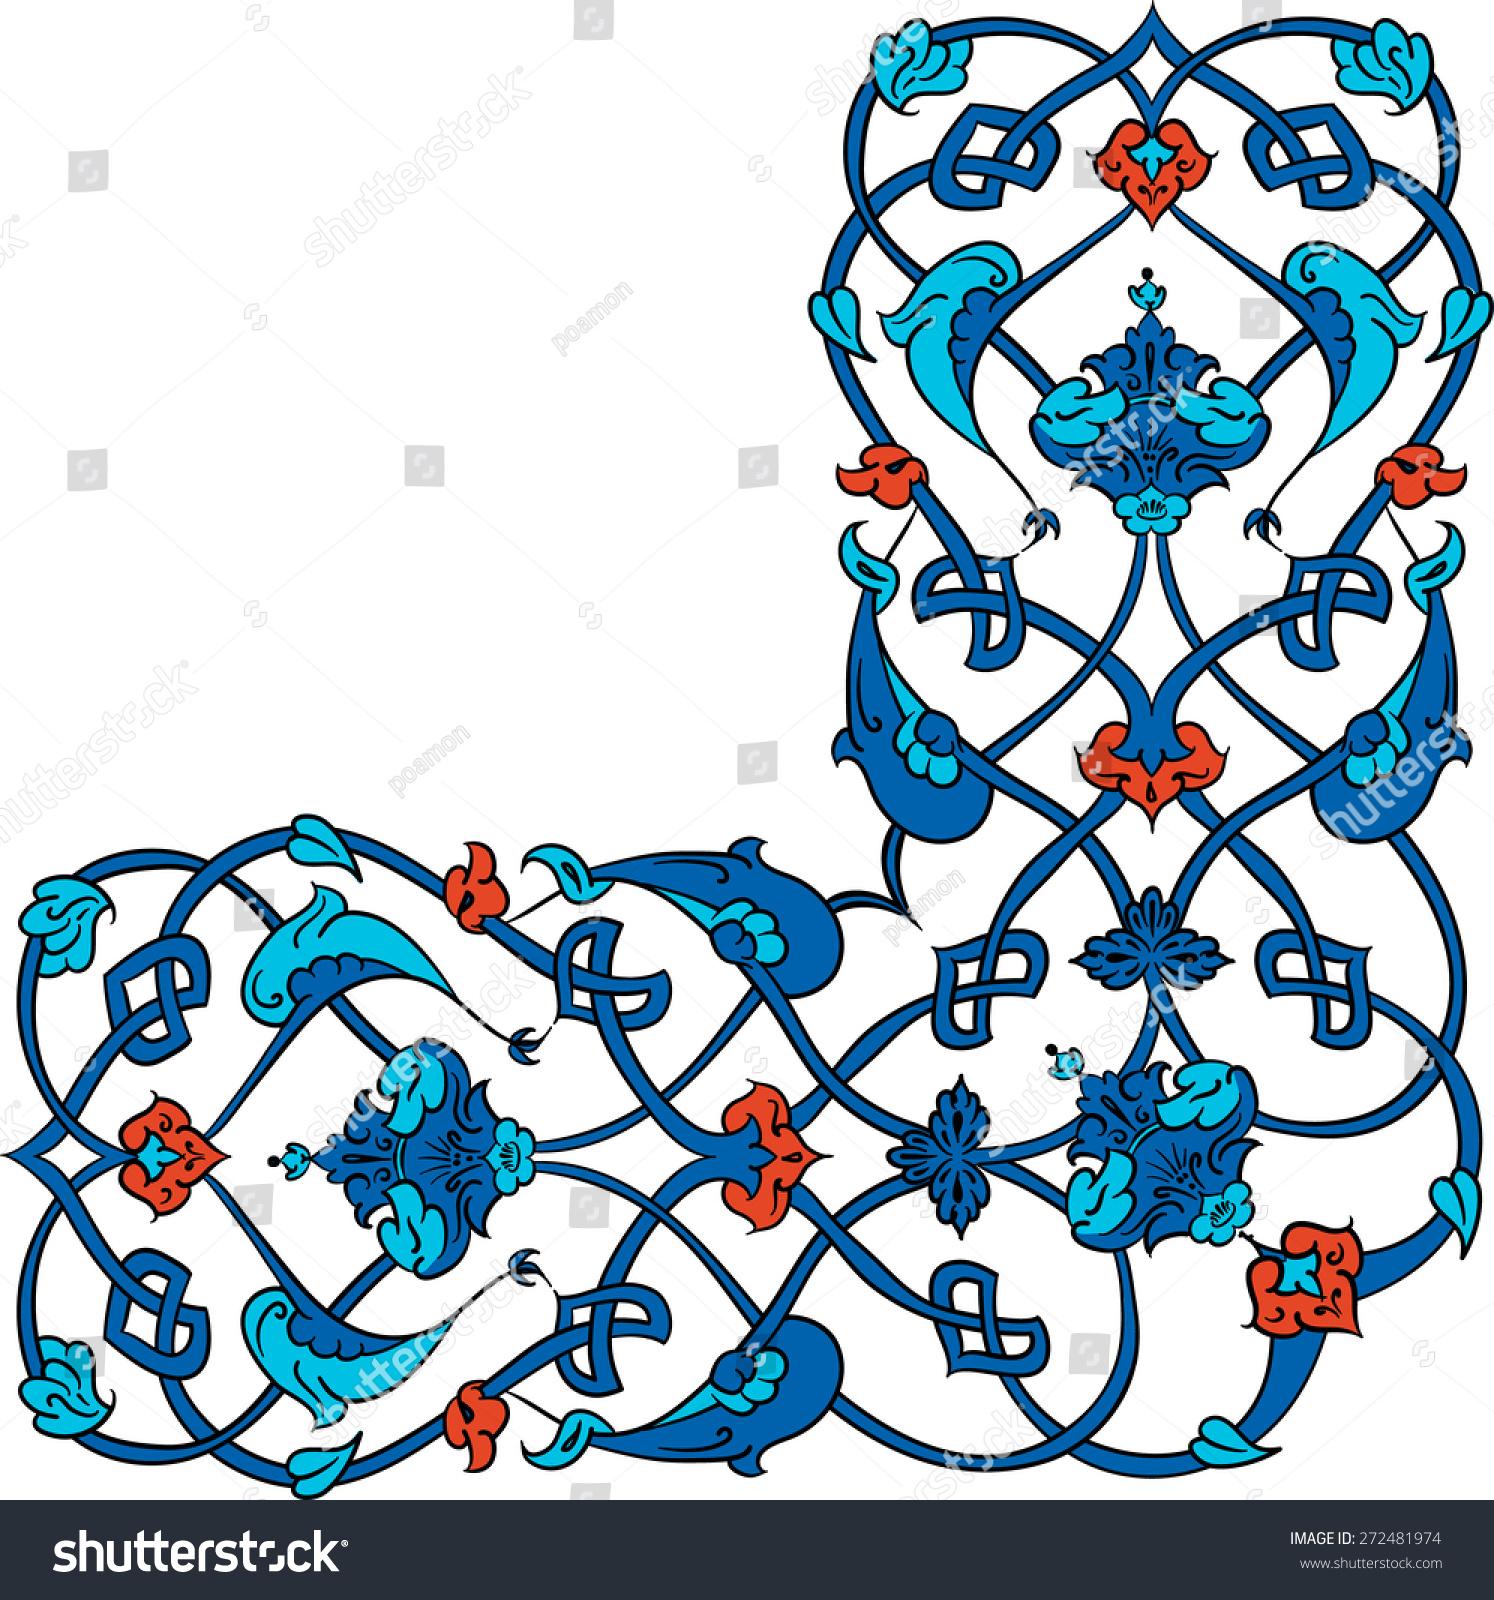 Traditional Turkish Ottoman Red Flower Home Decor Mosaic: Ottoman Turkish Arabic African Islamic Floral Stock Vector